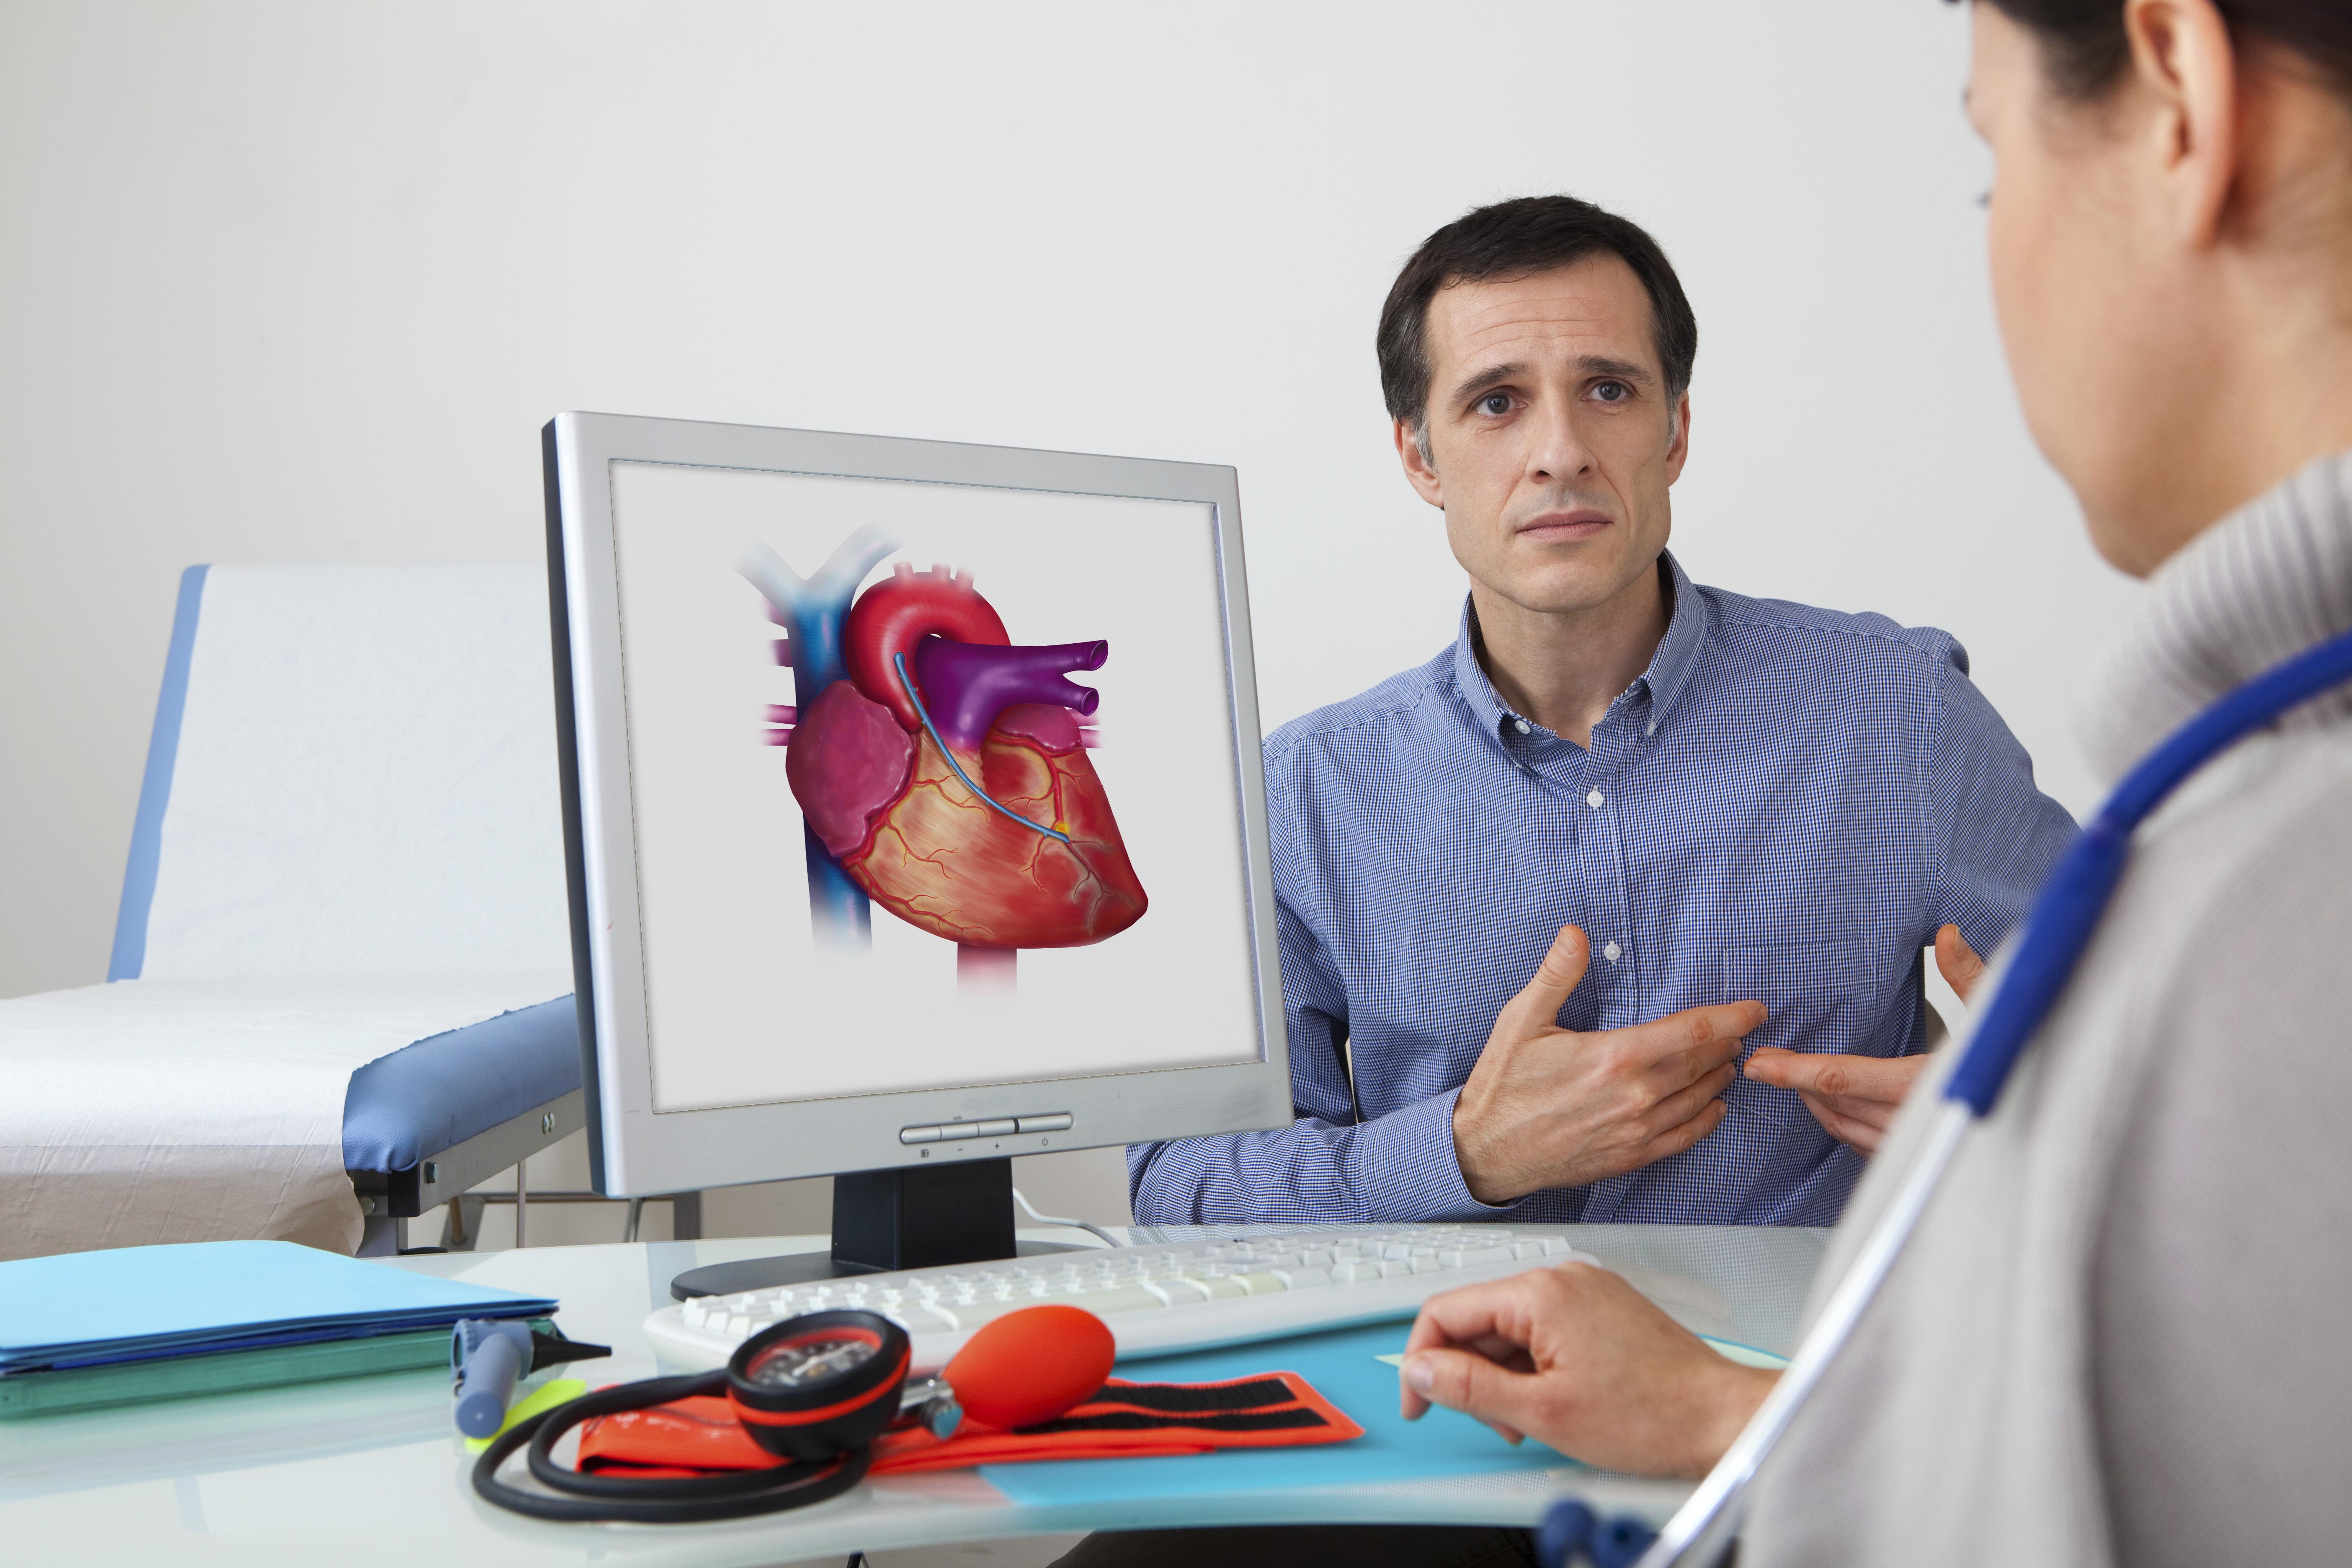 Koronavírus kardiológiai szövődményei